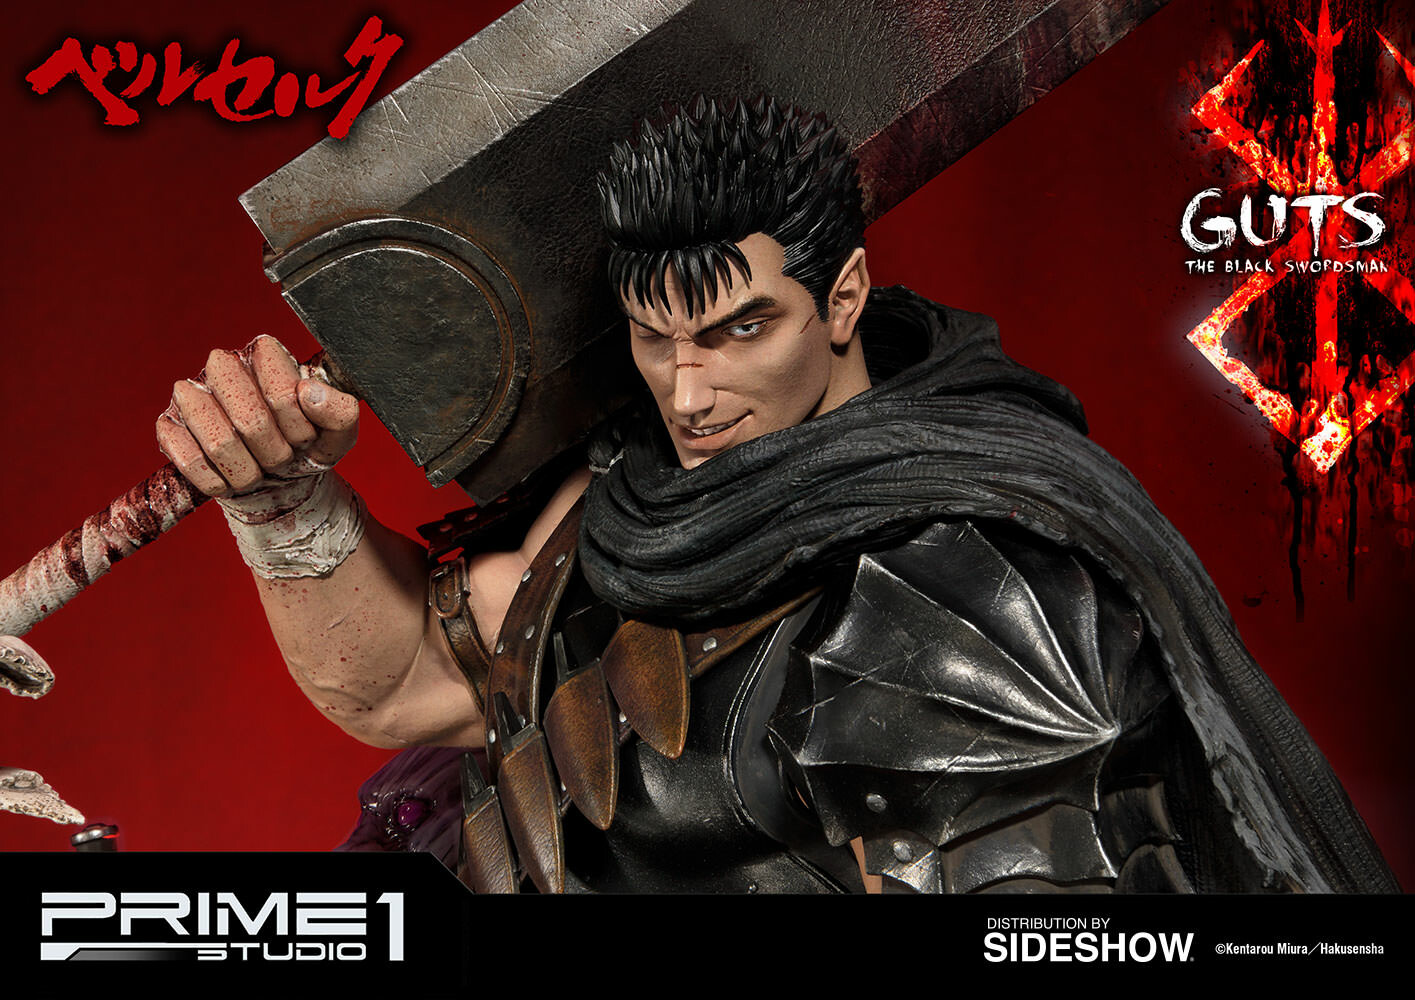 Alvaro ribeiro berserker guts the black swordsman statue prime1 studio 902975 30